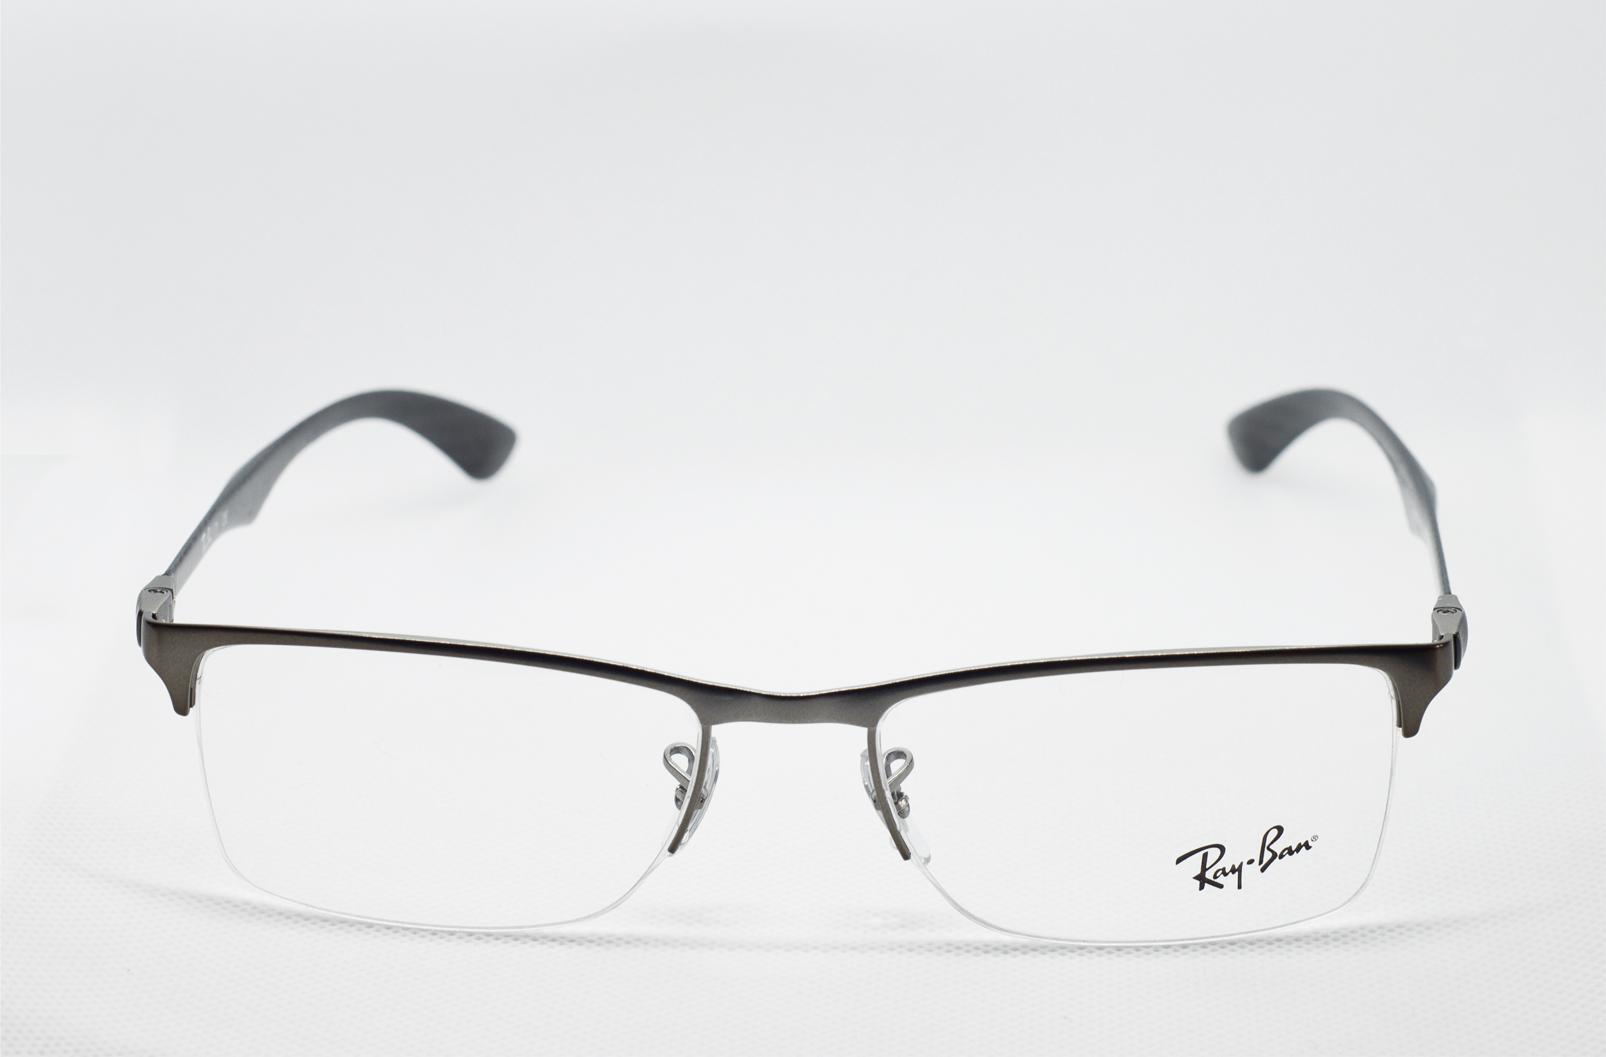 916fe2898e Okulary Oprawki RAY BAN RB 8413 2620 54-18 CARBON - 7356528943 ...